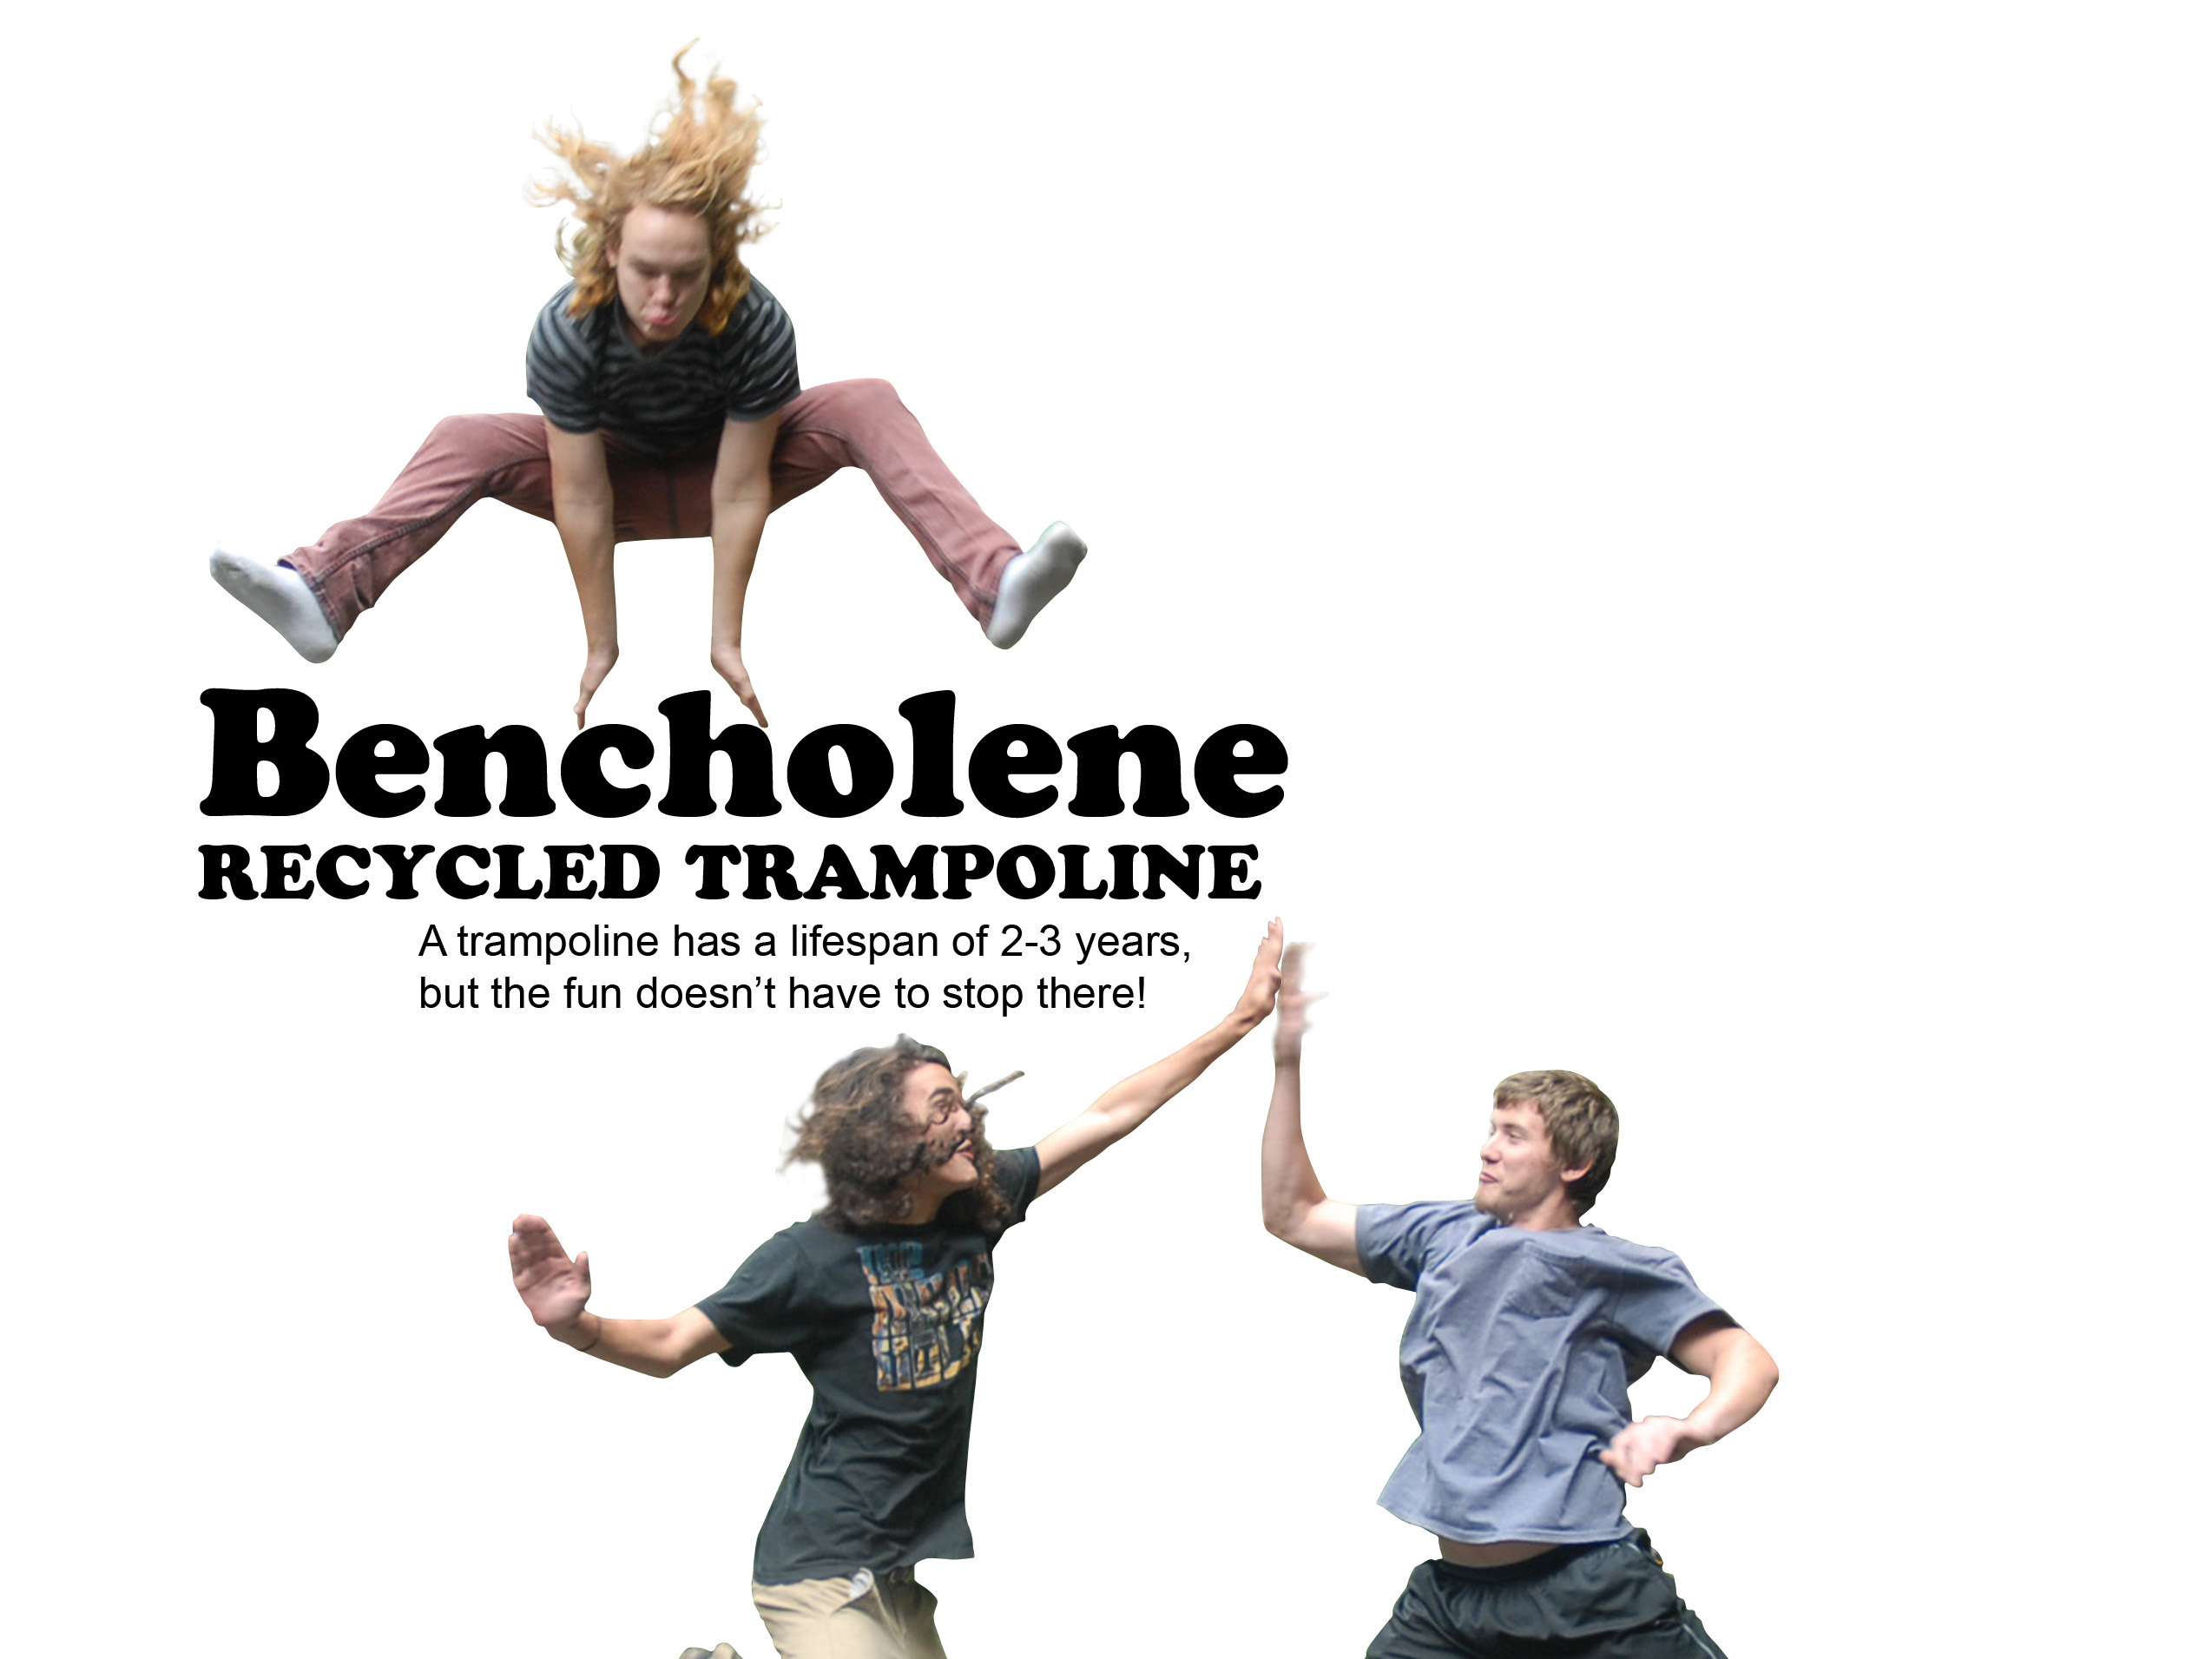 New Project: Bencholene